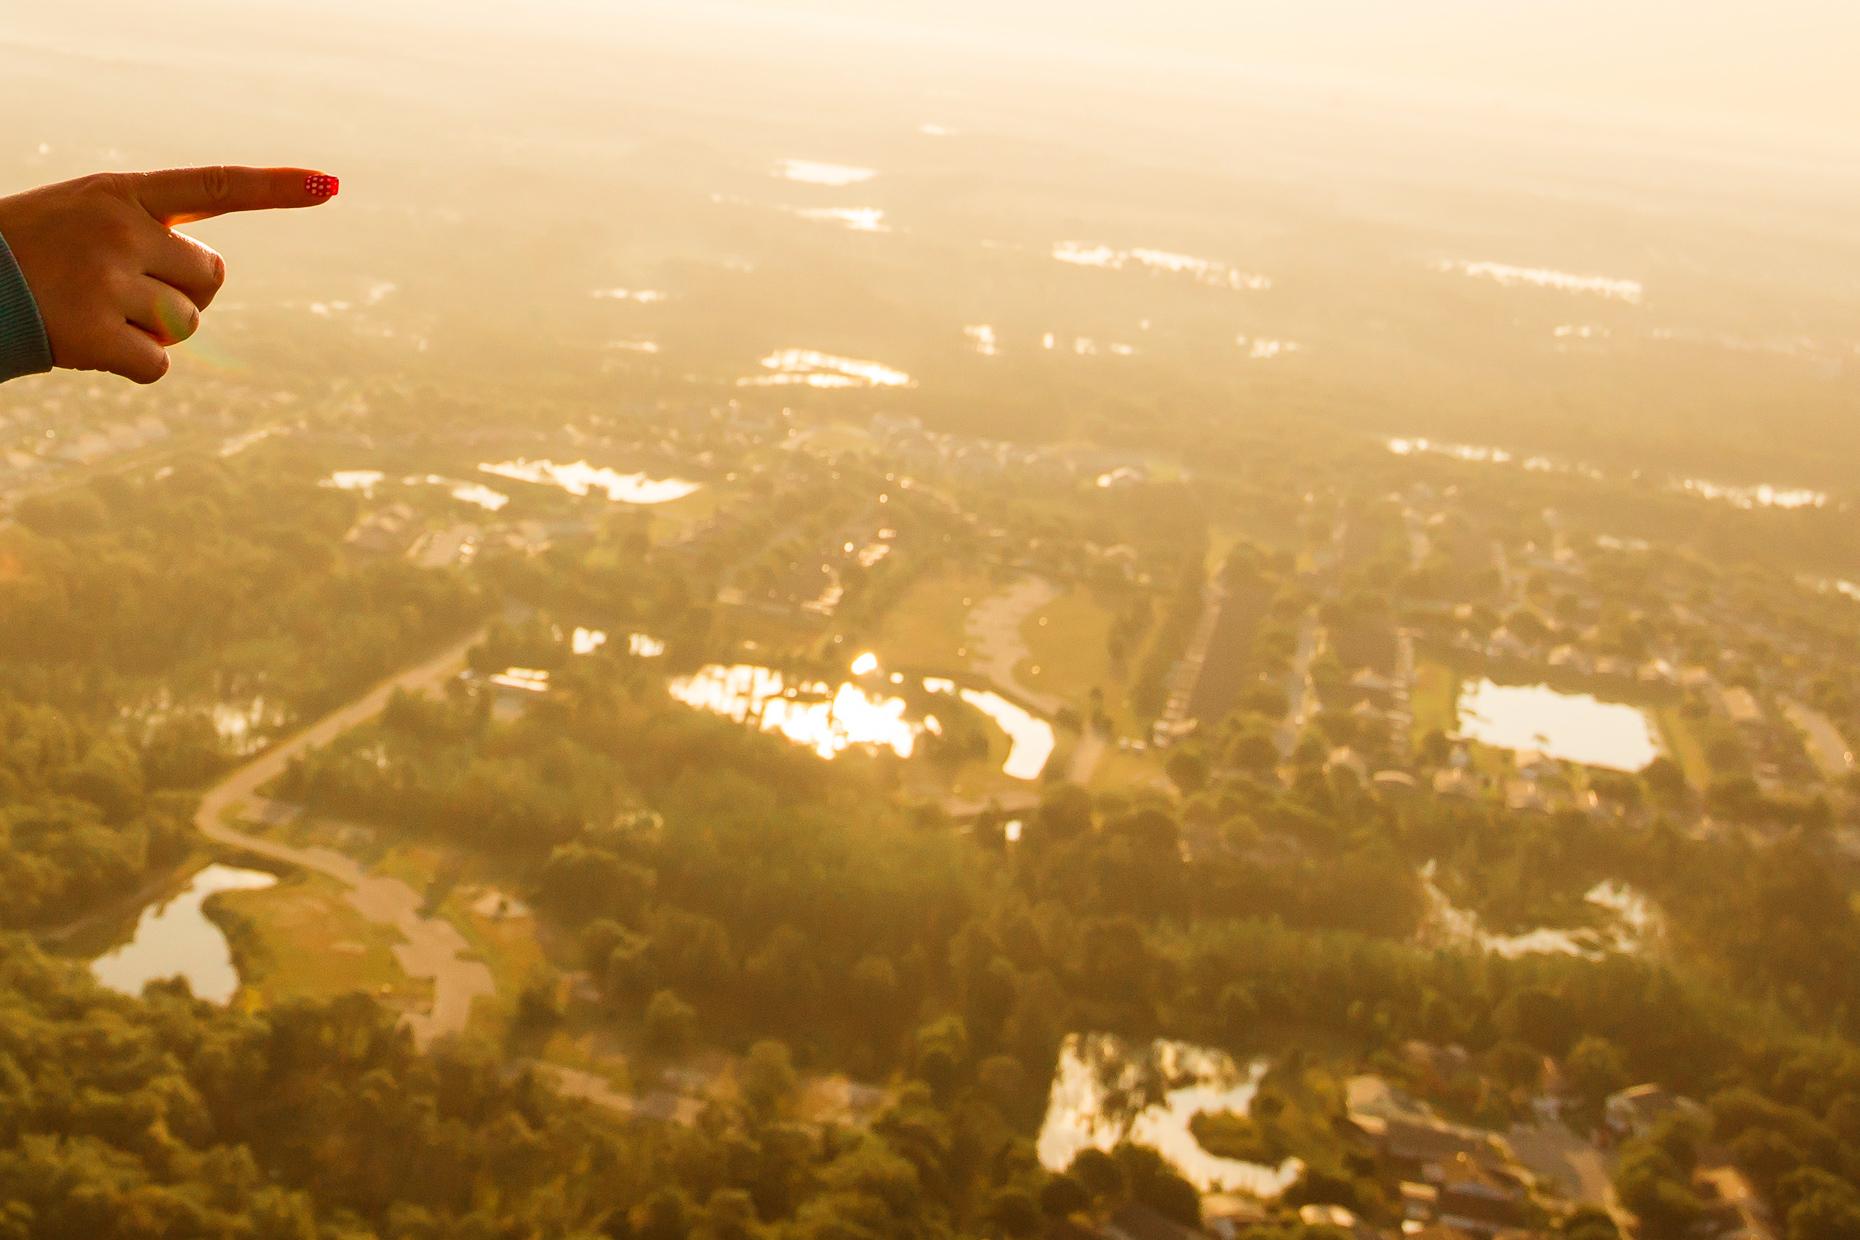 hot air balloon lock and land chip litherland orlando 0014.JPG